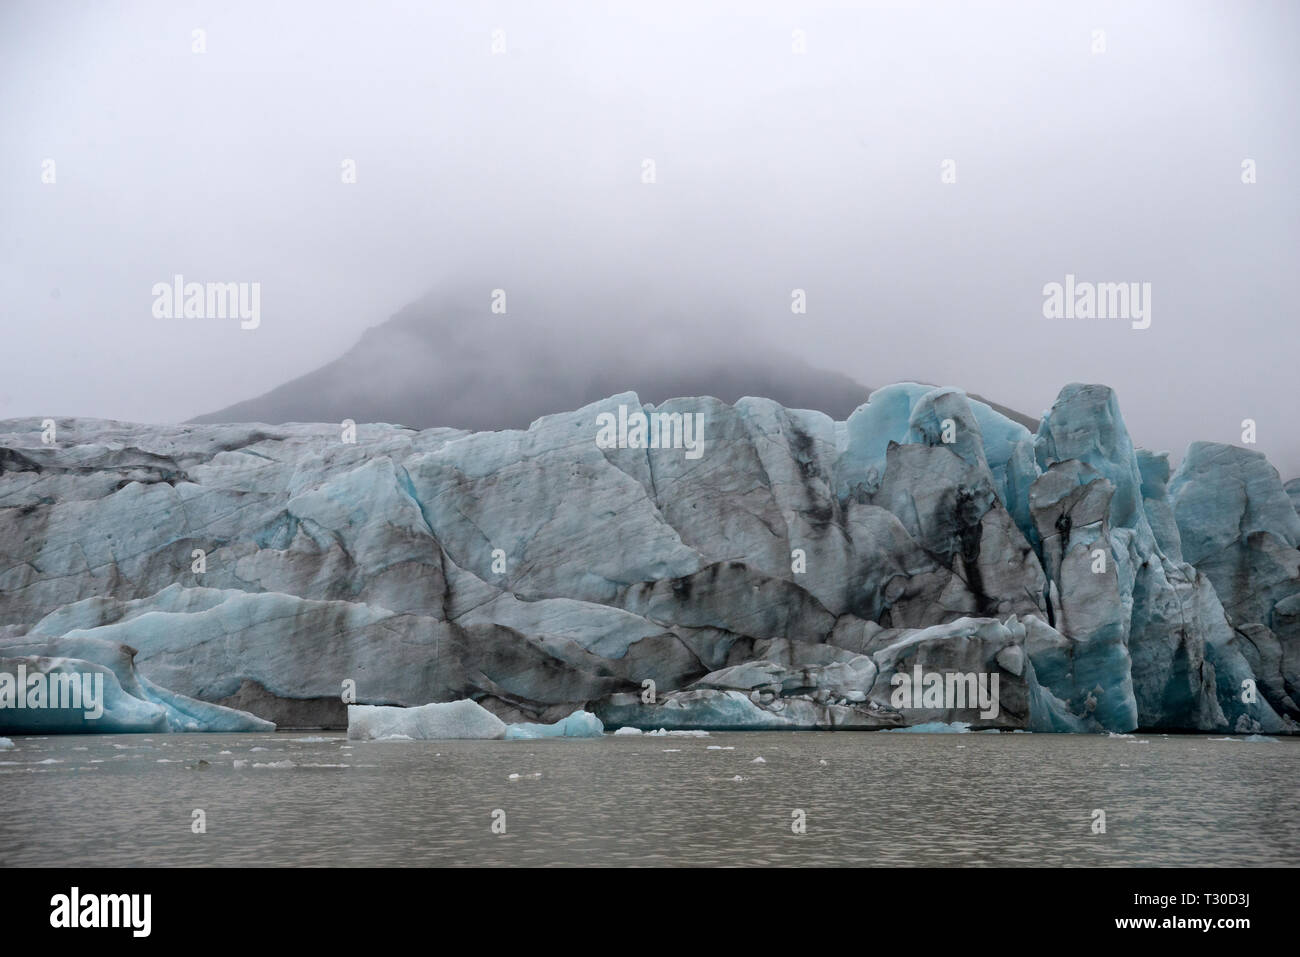 Icebergs in Jokulsarlon beautiful glacial lagoon in Iceland. Jokulsarlon is a famous travel destination in Vatnajokull National Park,  Iceland, - Stock Image